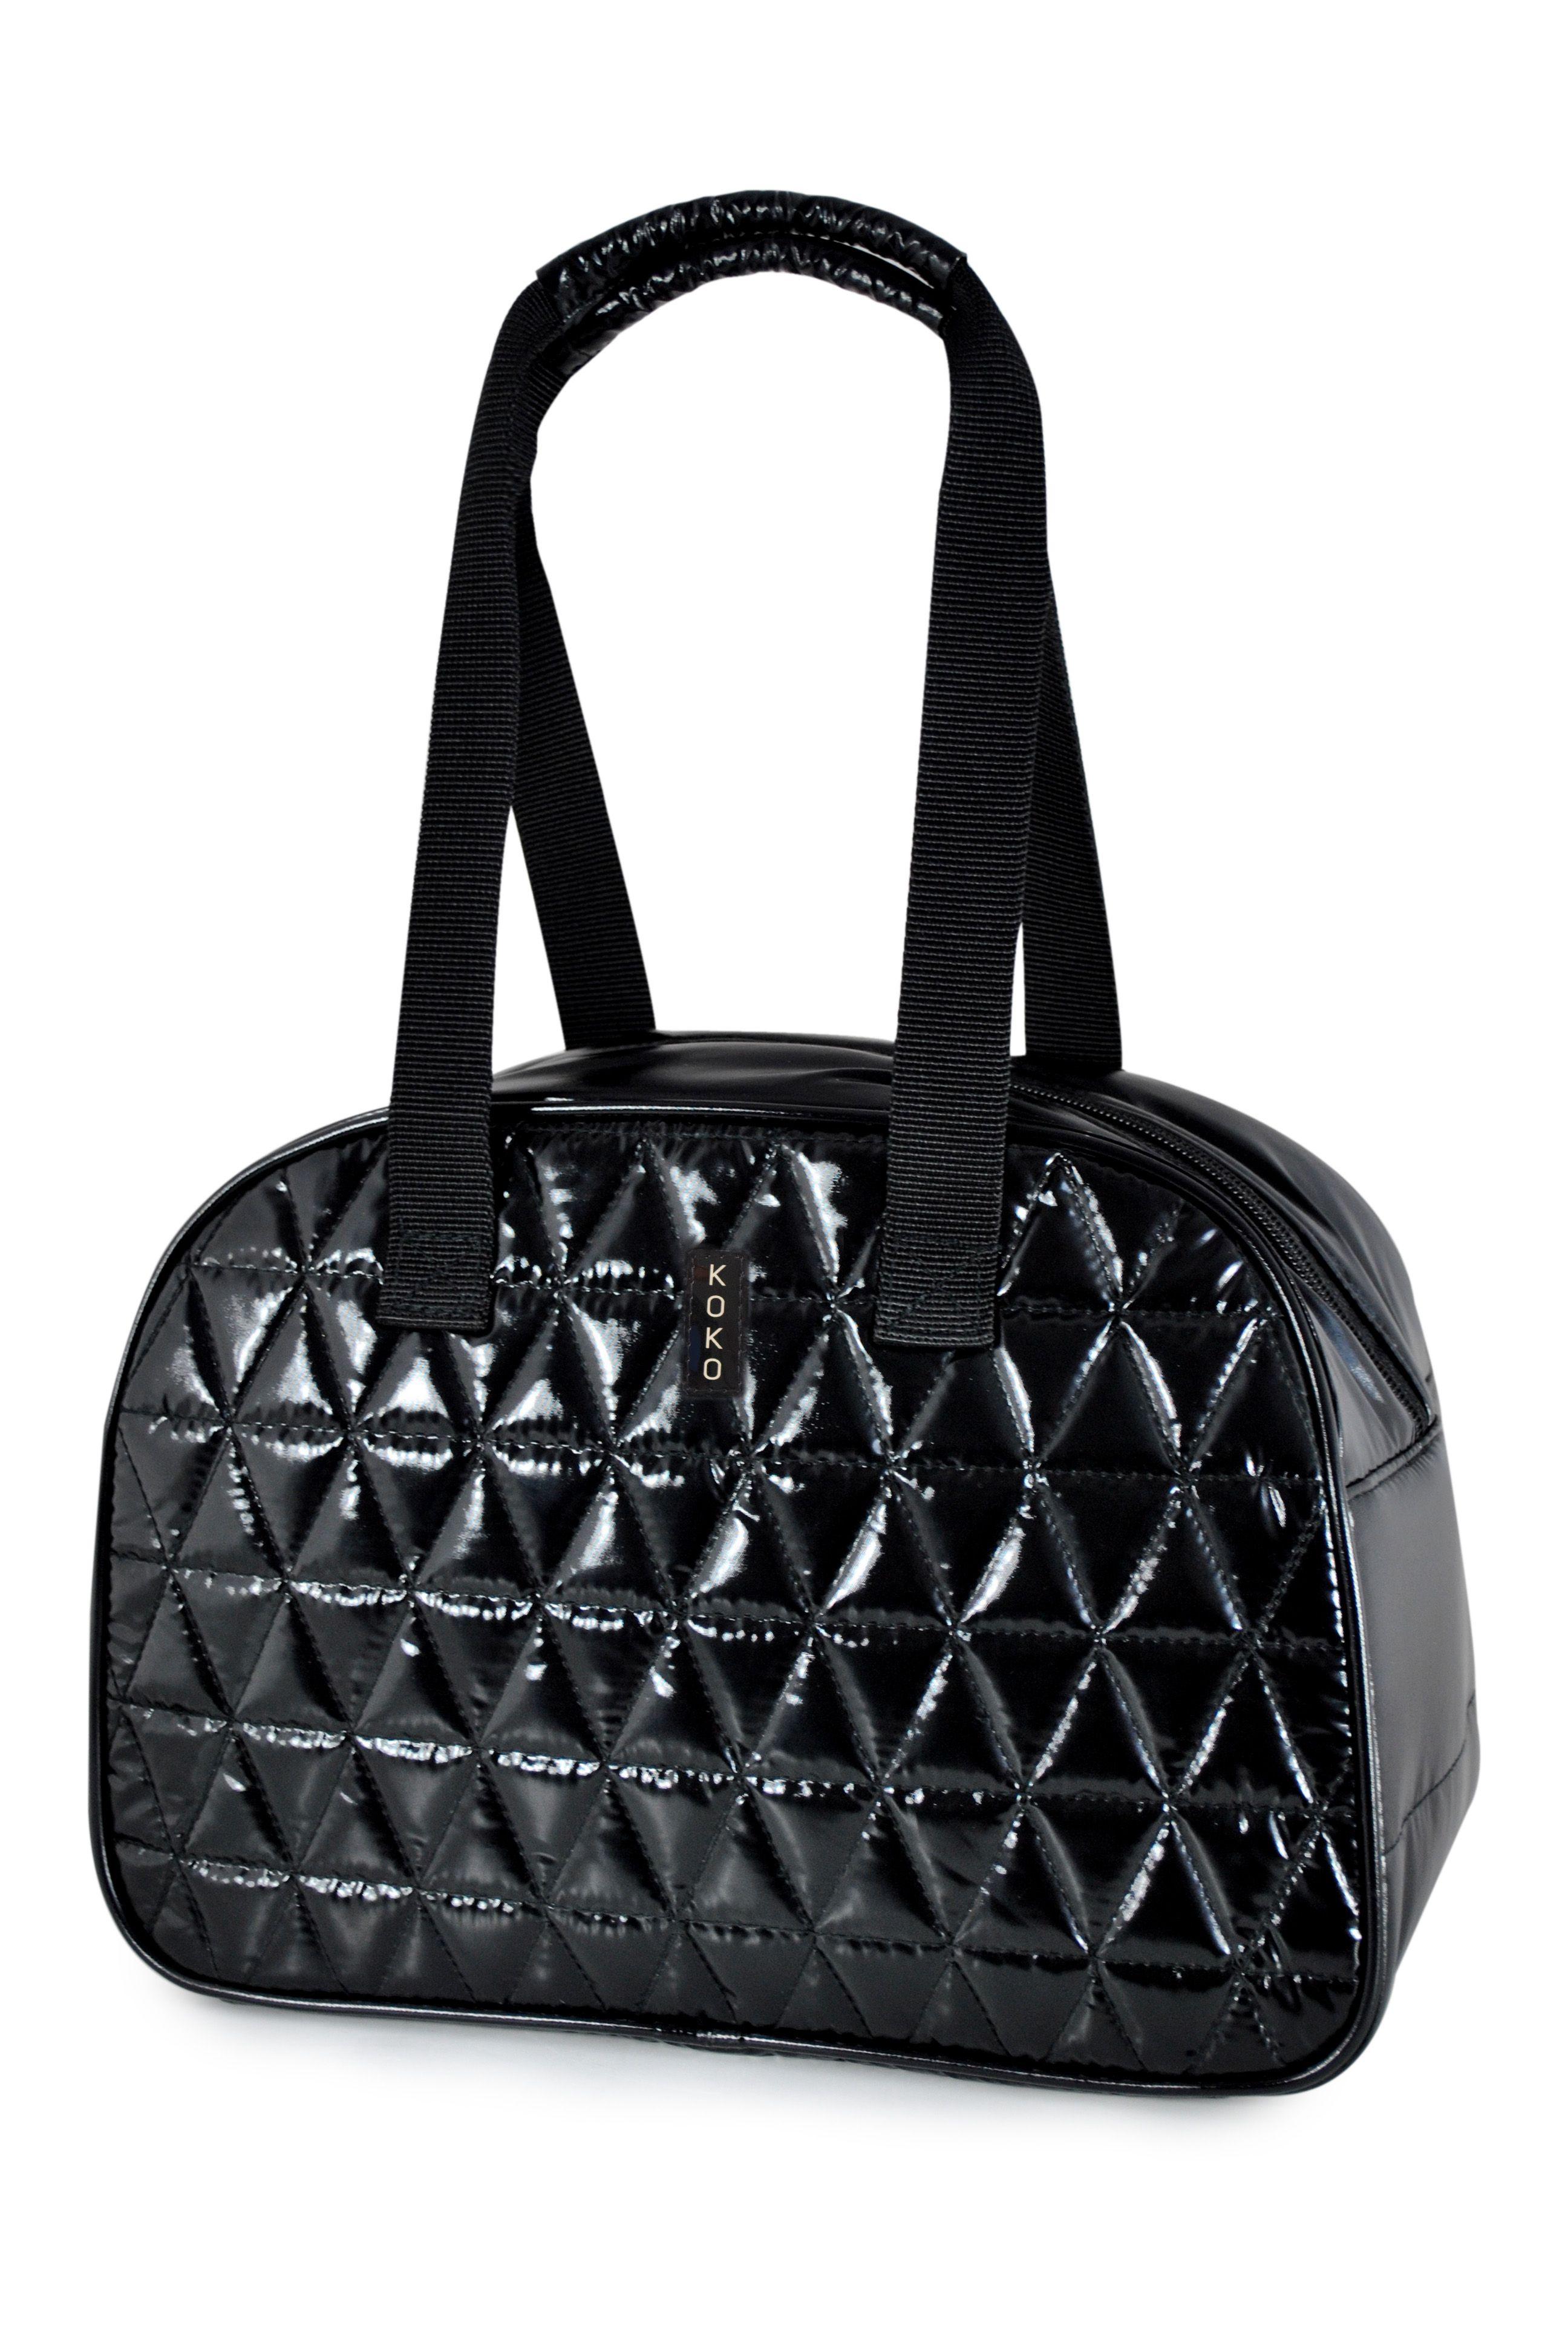 Dima Black Insulated Lunch Bag By Koko Koko Fashion